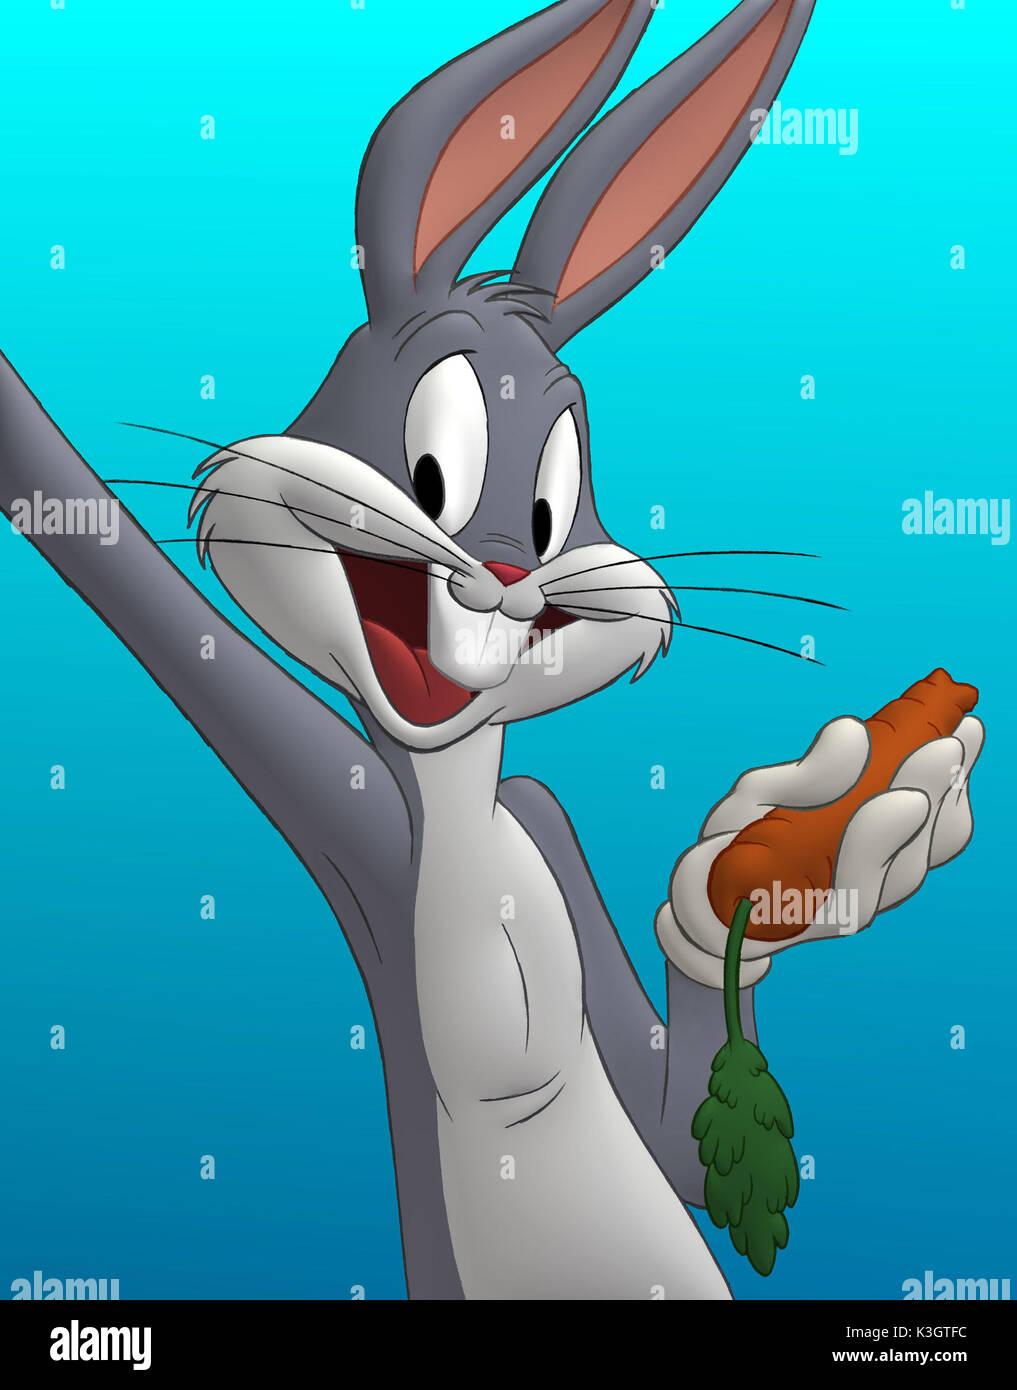 Bugs bunny and lola bunny hugging